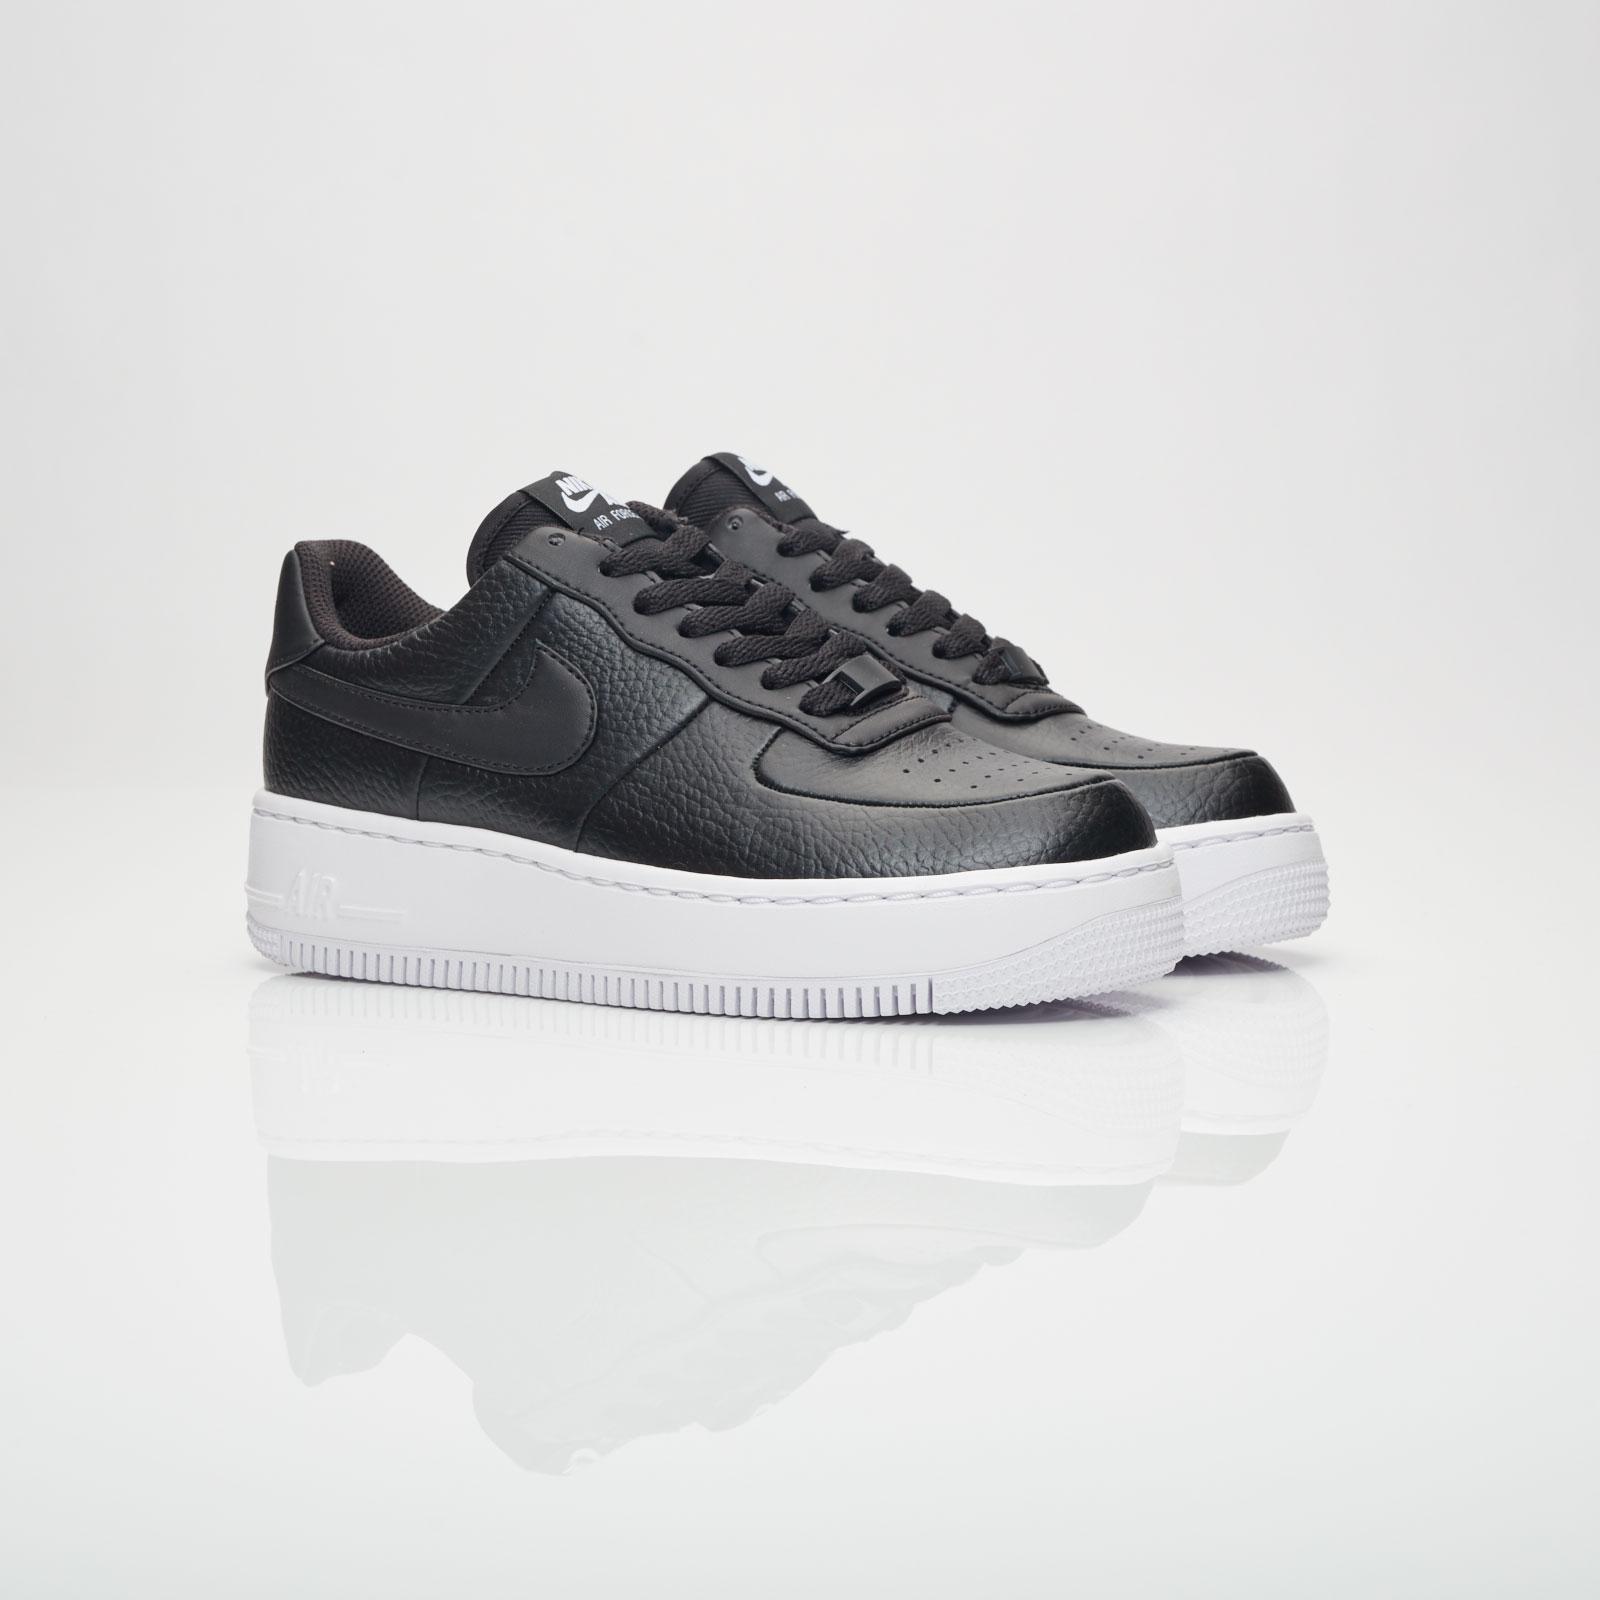 Nike Wmns AF1 Upstep - 917588-001